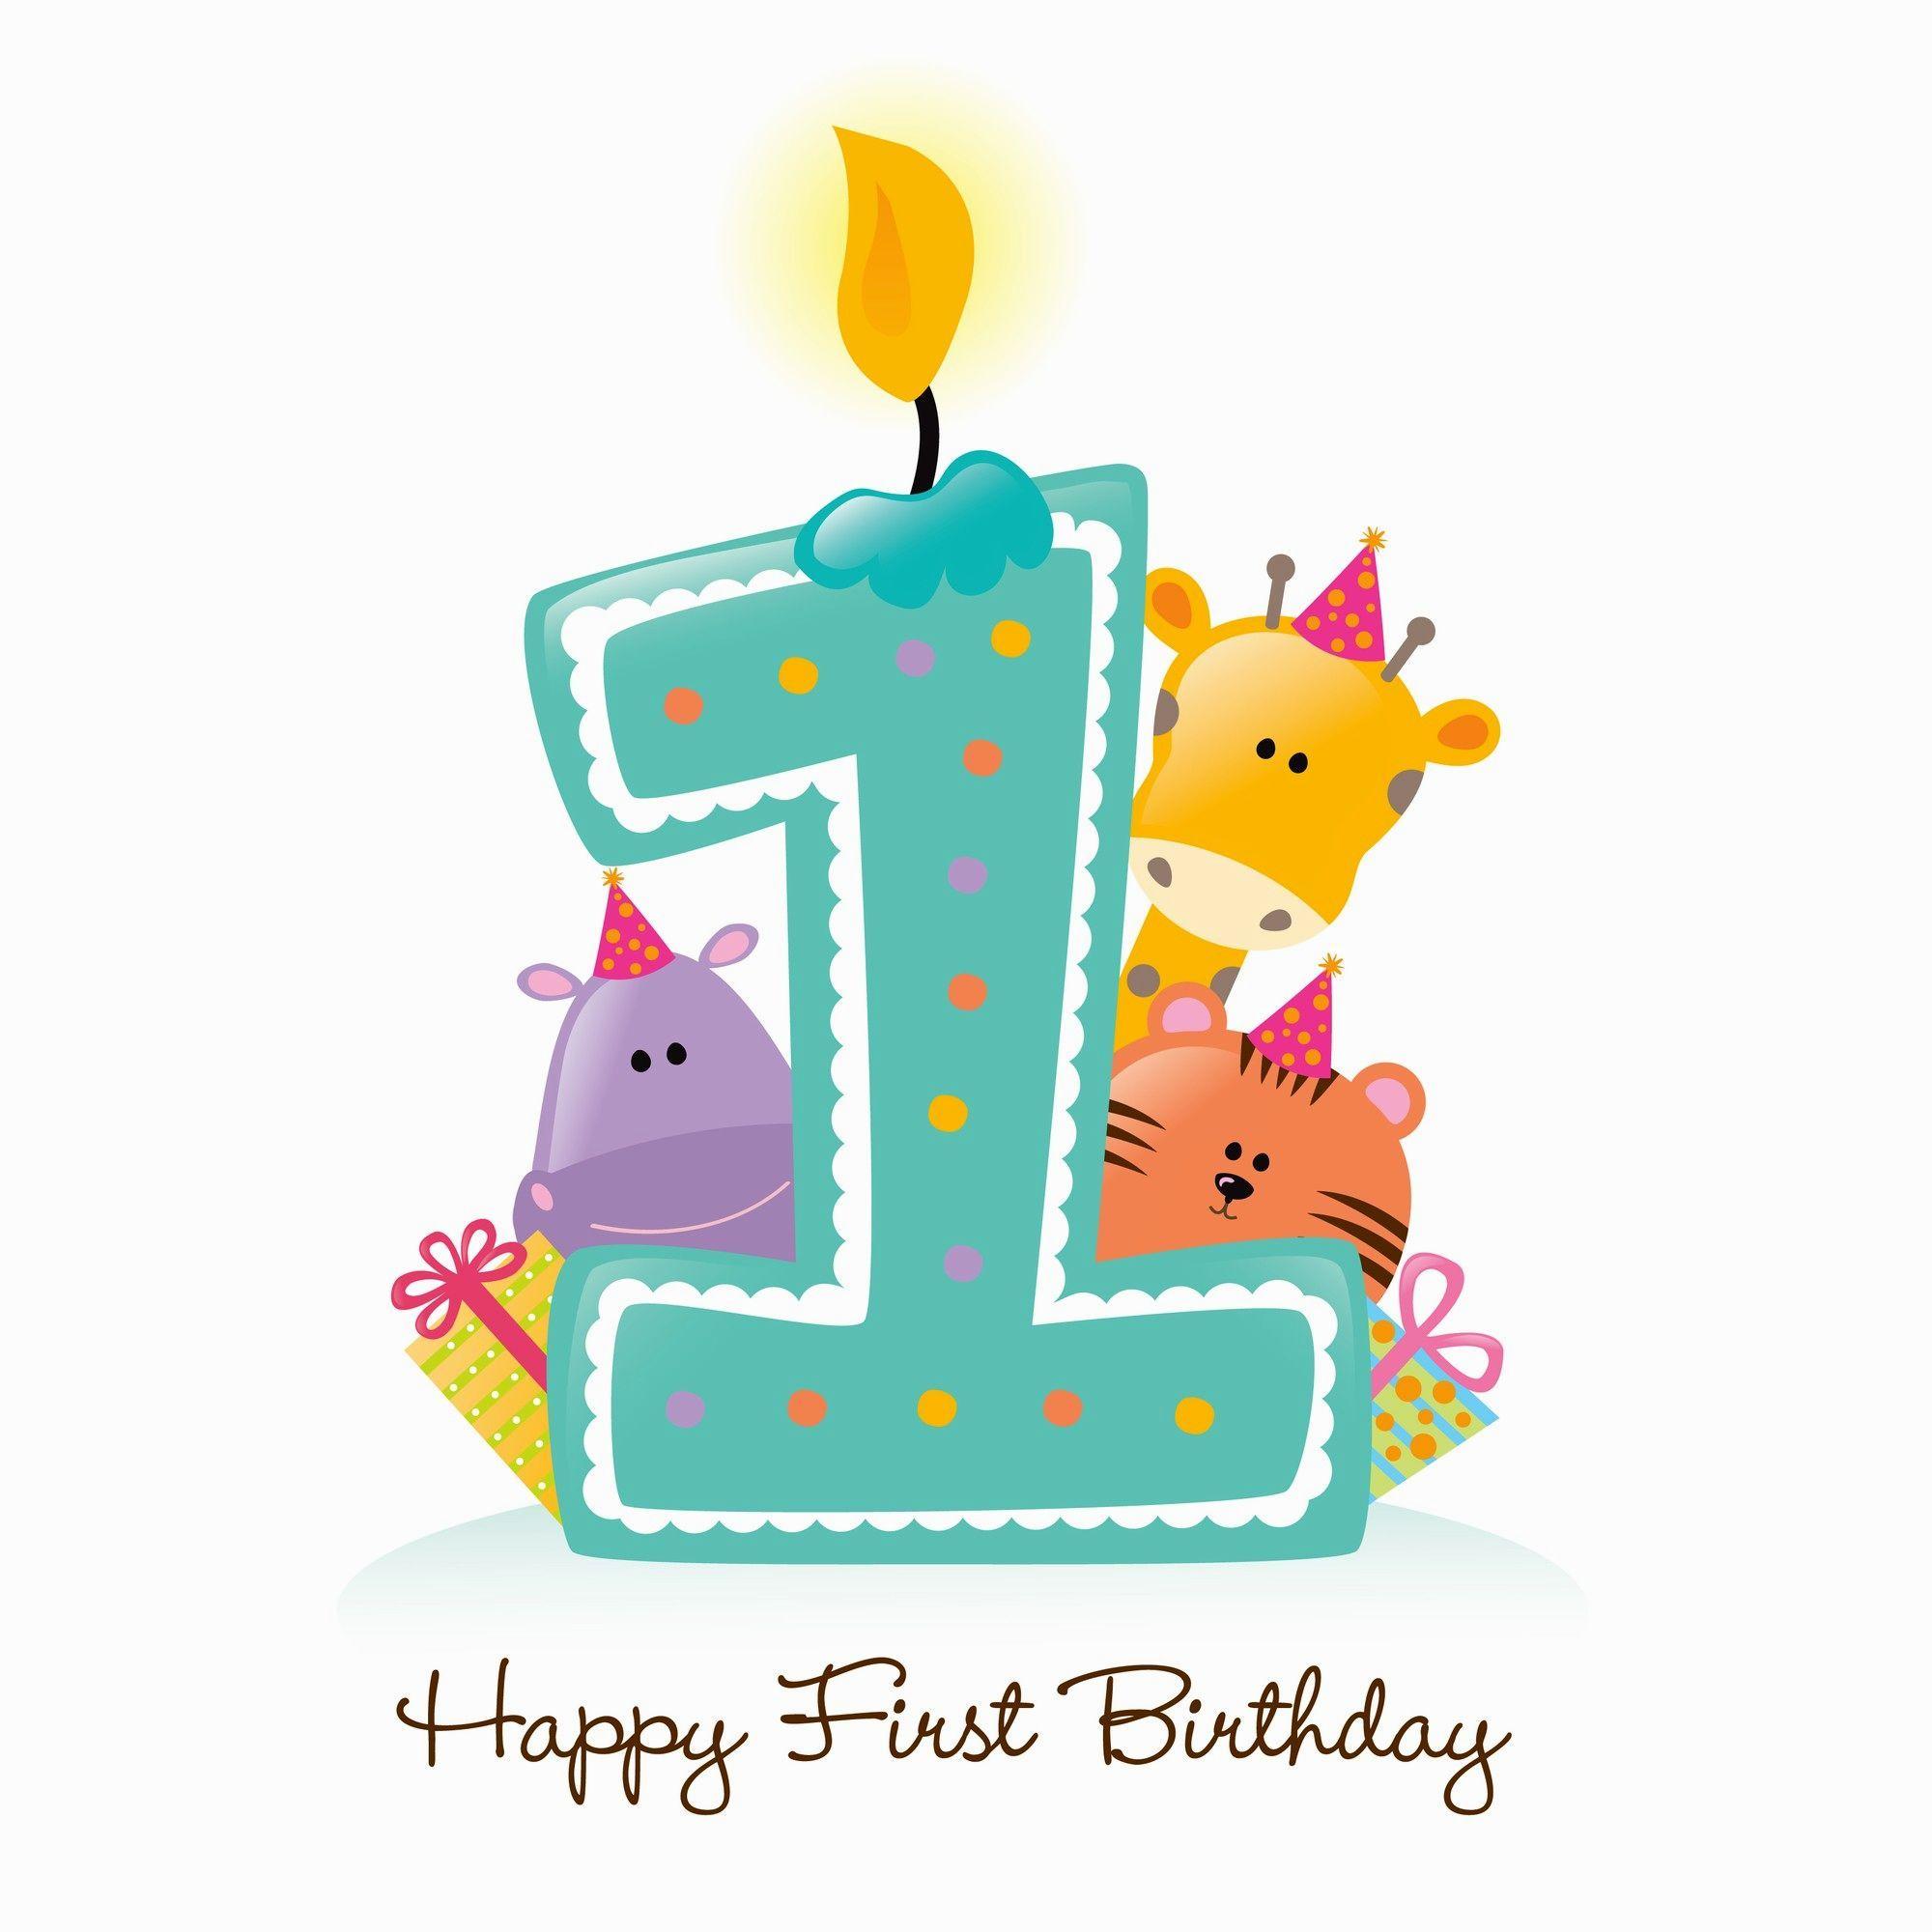 Happy first birthday Happy first birthday, Happy 1st